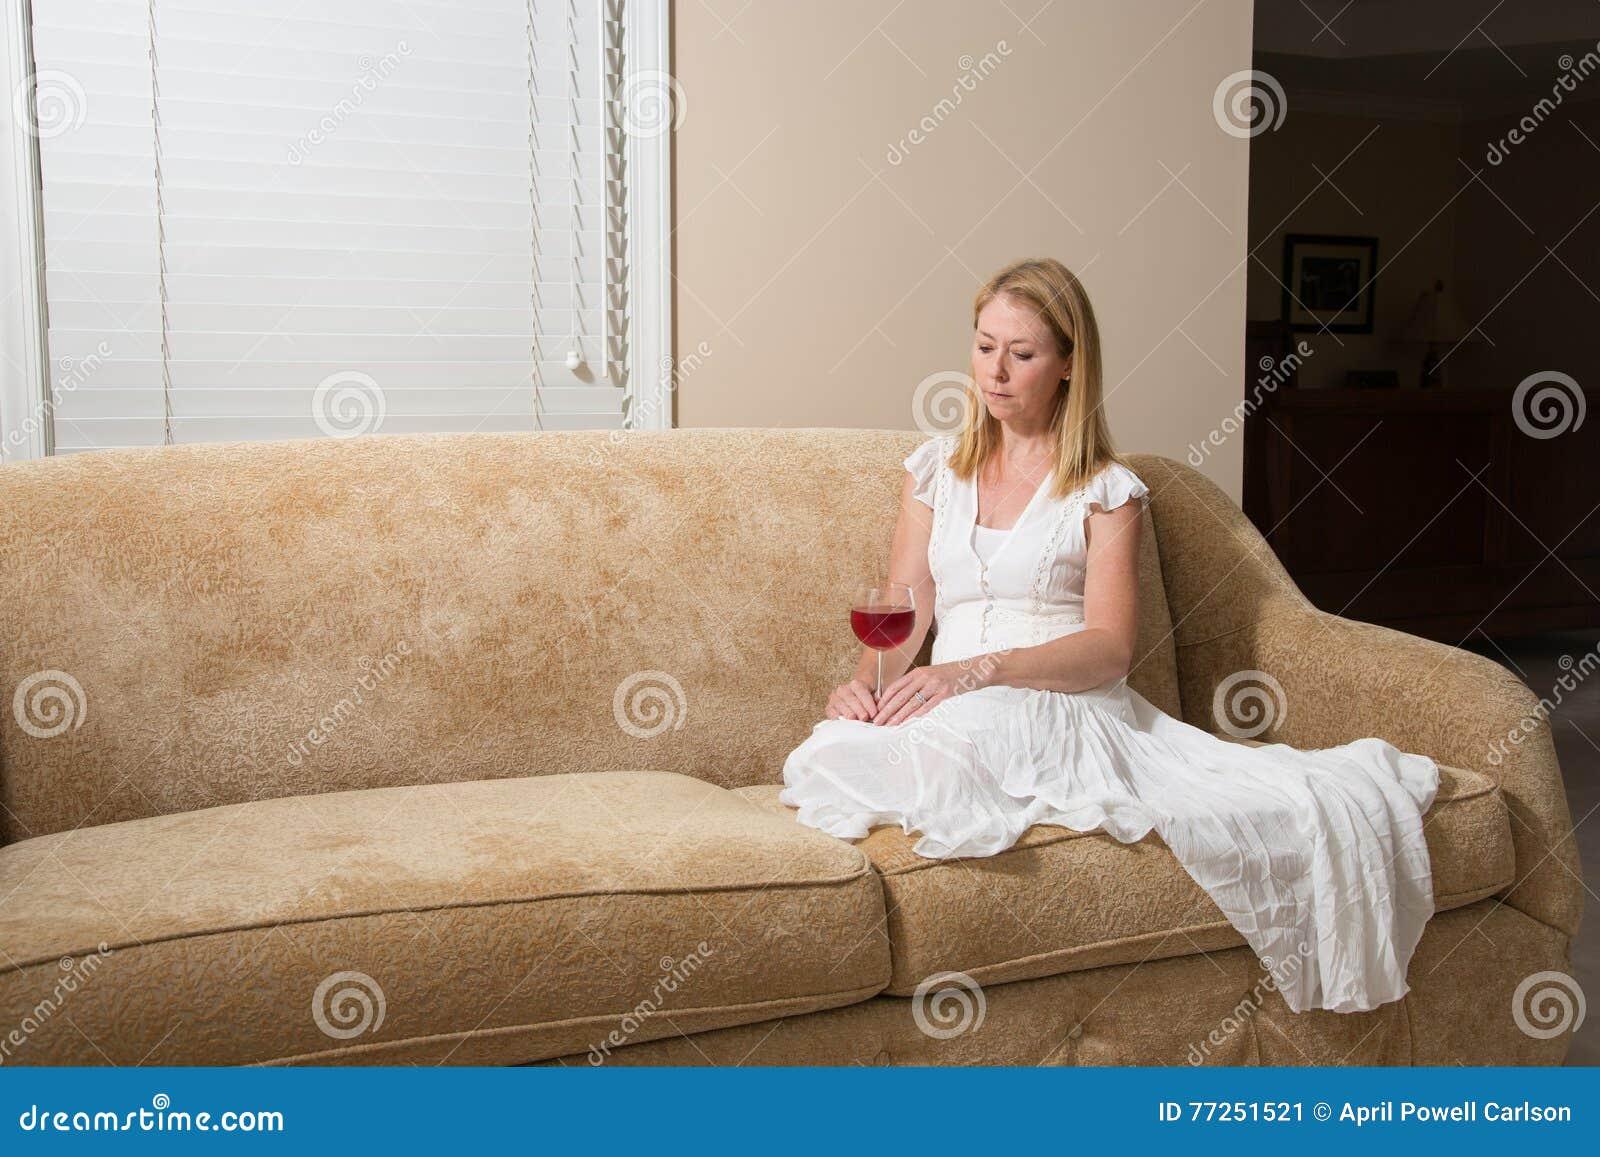 Awe Inspiring Woman Relaxing With Glass Of Wine At Home Stock Image Inzonedesignstudio Interior Chair Design Inzonedesignstudiocom